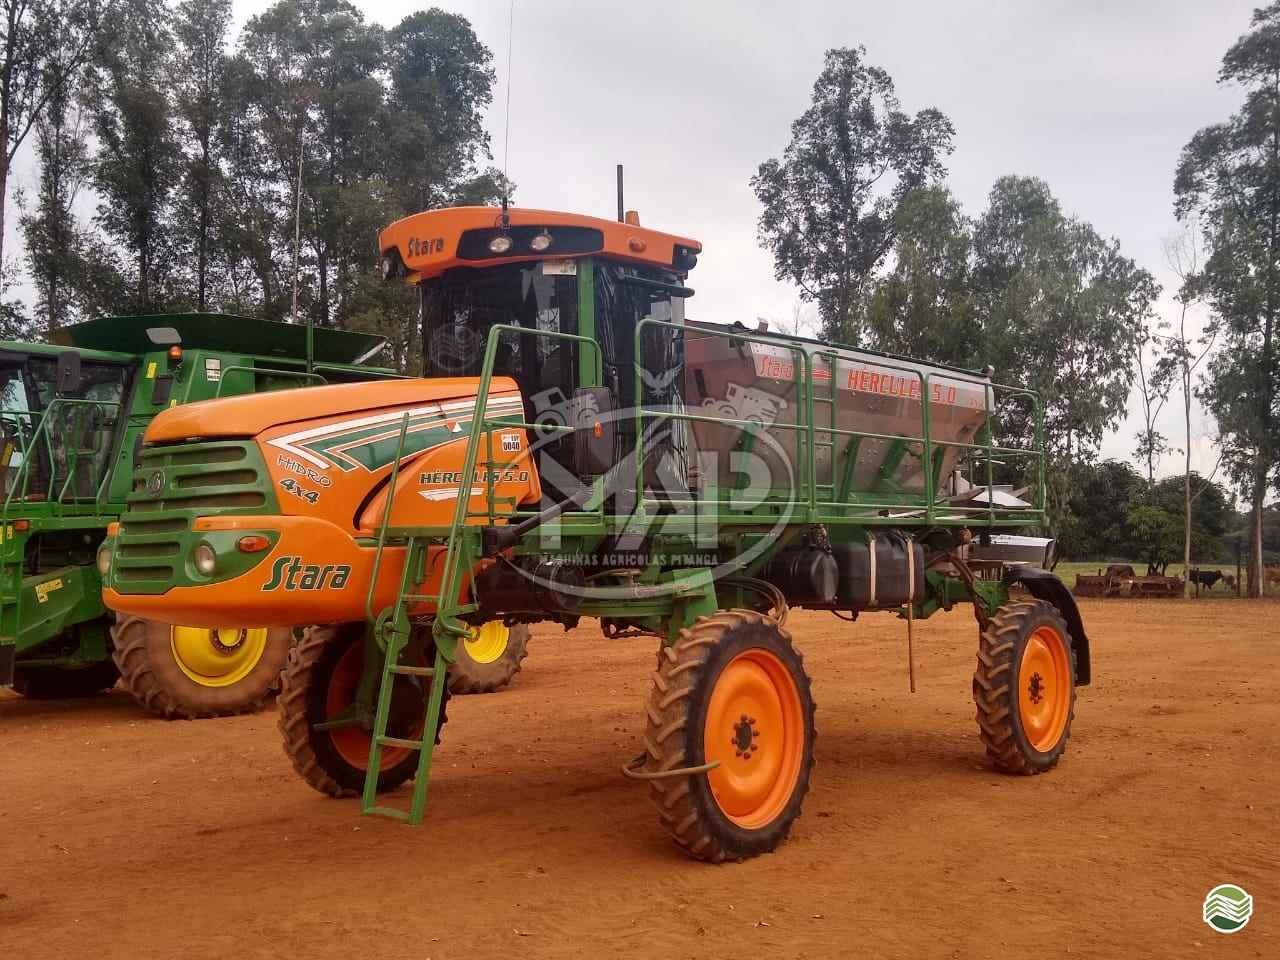 DISTRIBUIDOR AUTOPROPELIDO STARA HERCULES 5.0 Tração 4x4 Máquinas Agrícolas Pitanga PITANGA PARANÁ PR